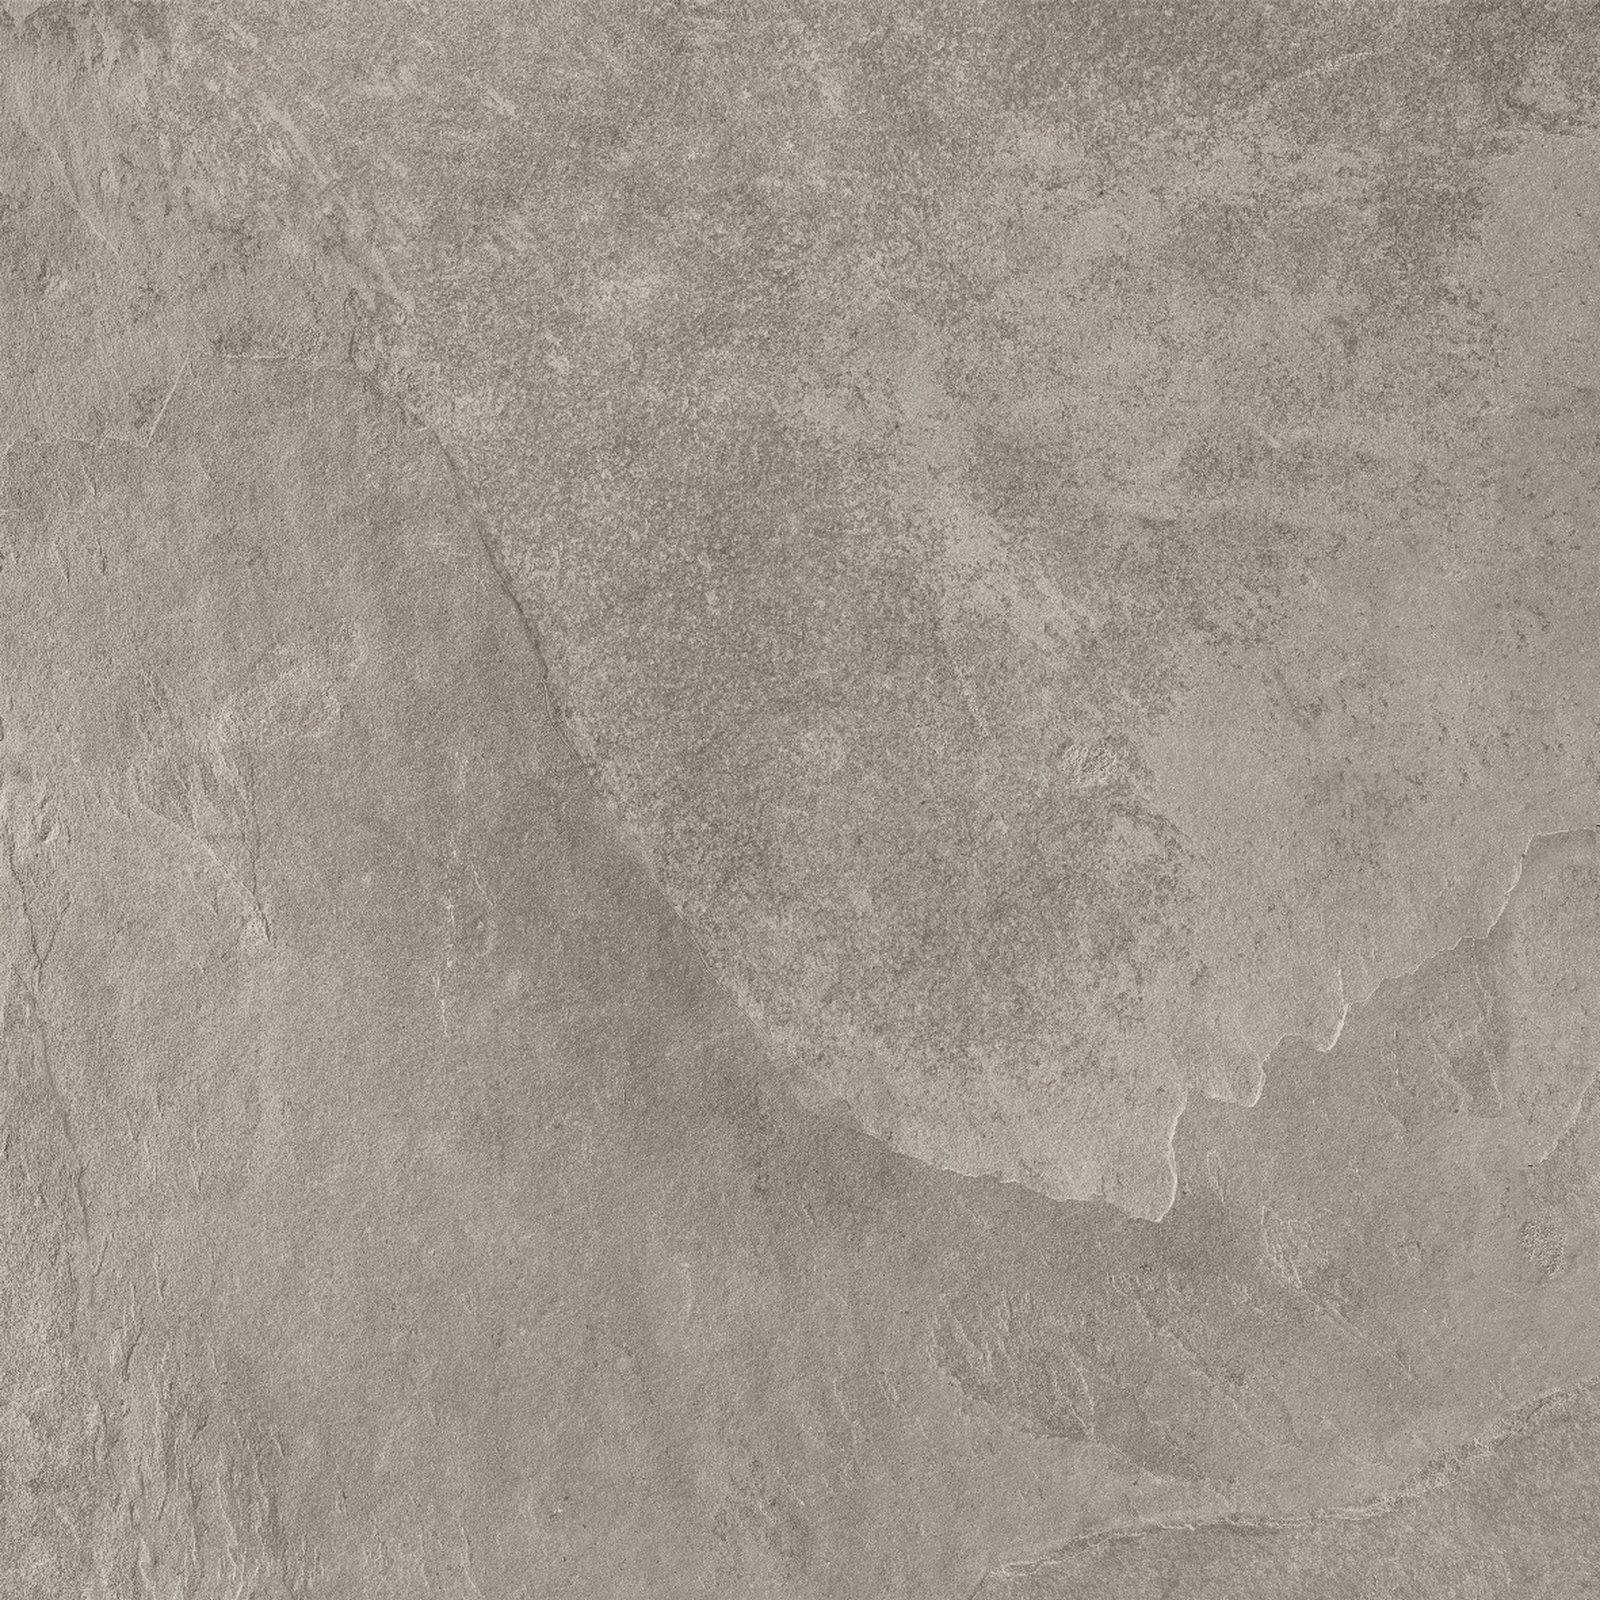 SLATE GREY (X604F8R) изображение 4